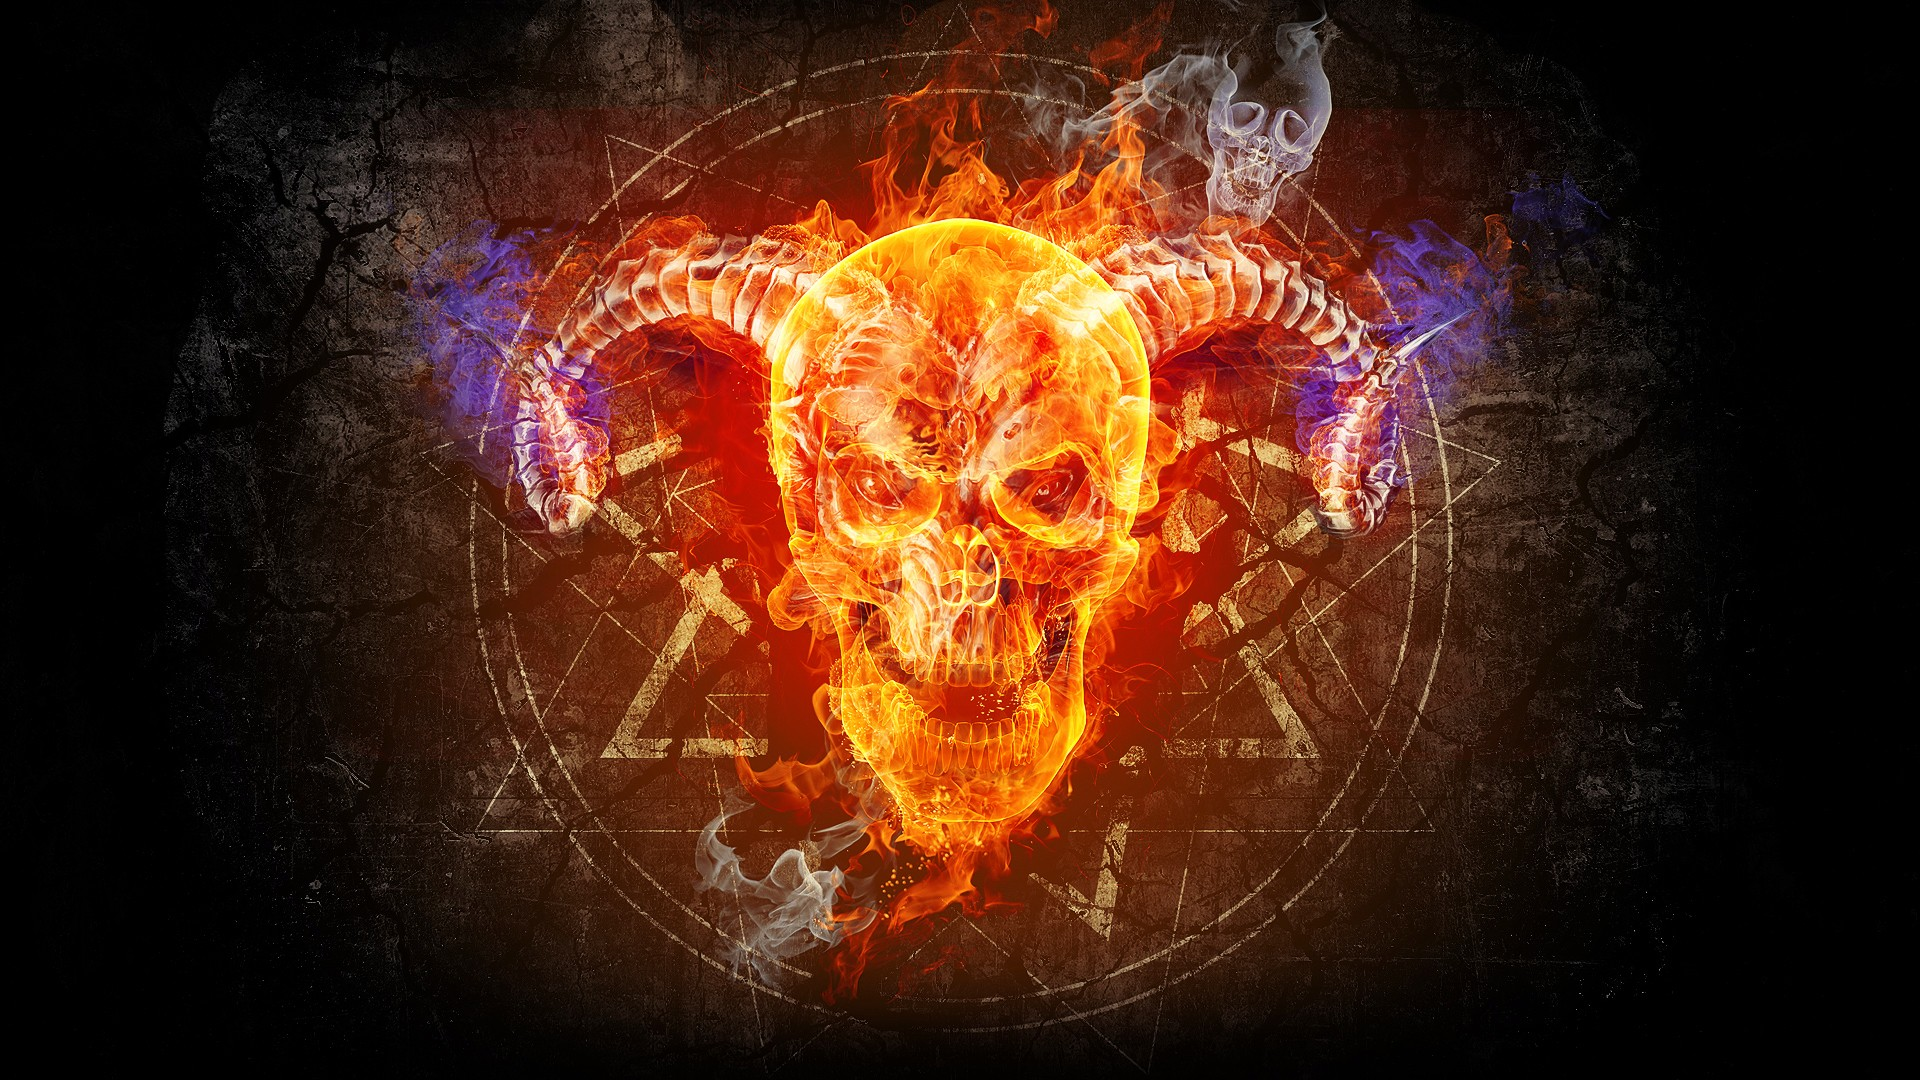 wallpopercomimages00253567abstract skulls 00253567jpg 1920x1080